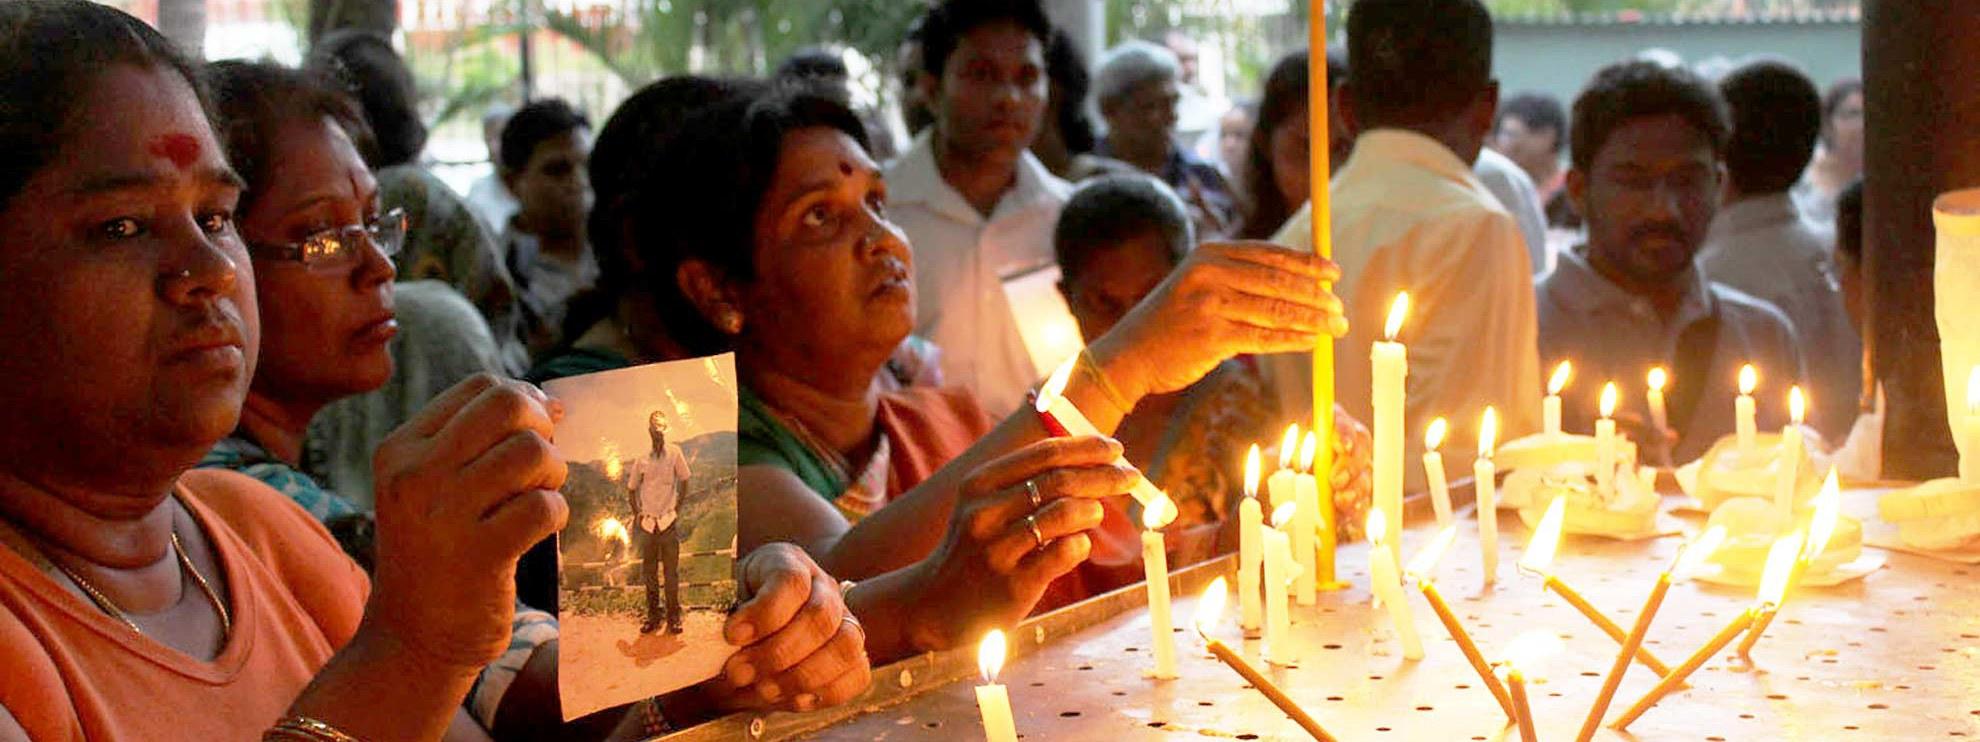 Angehörige protestieren gegen das Verschwinden von Verwandten in Colombo, 12. Januar 2012. © Vikalpasl / Creative Commons